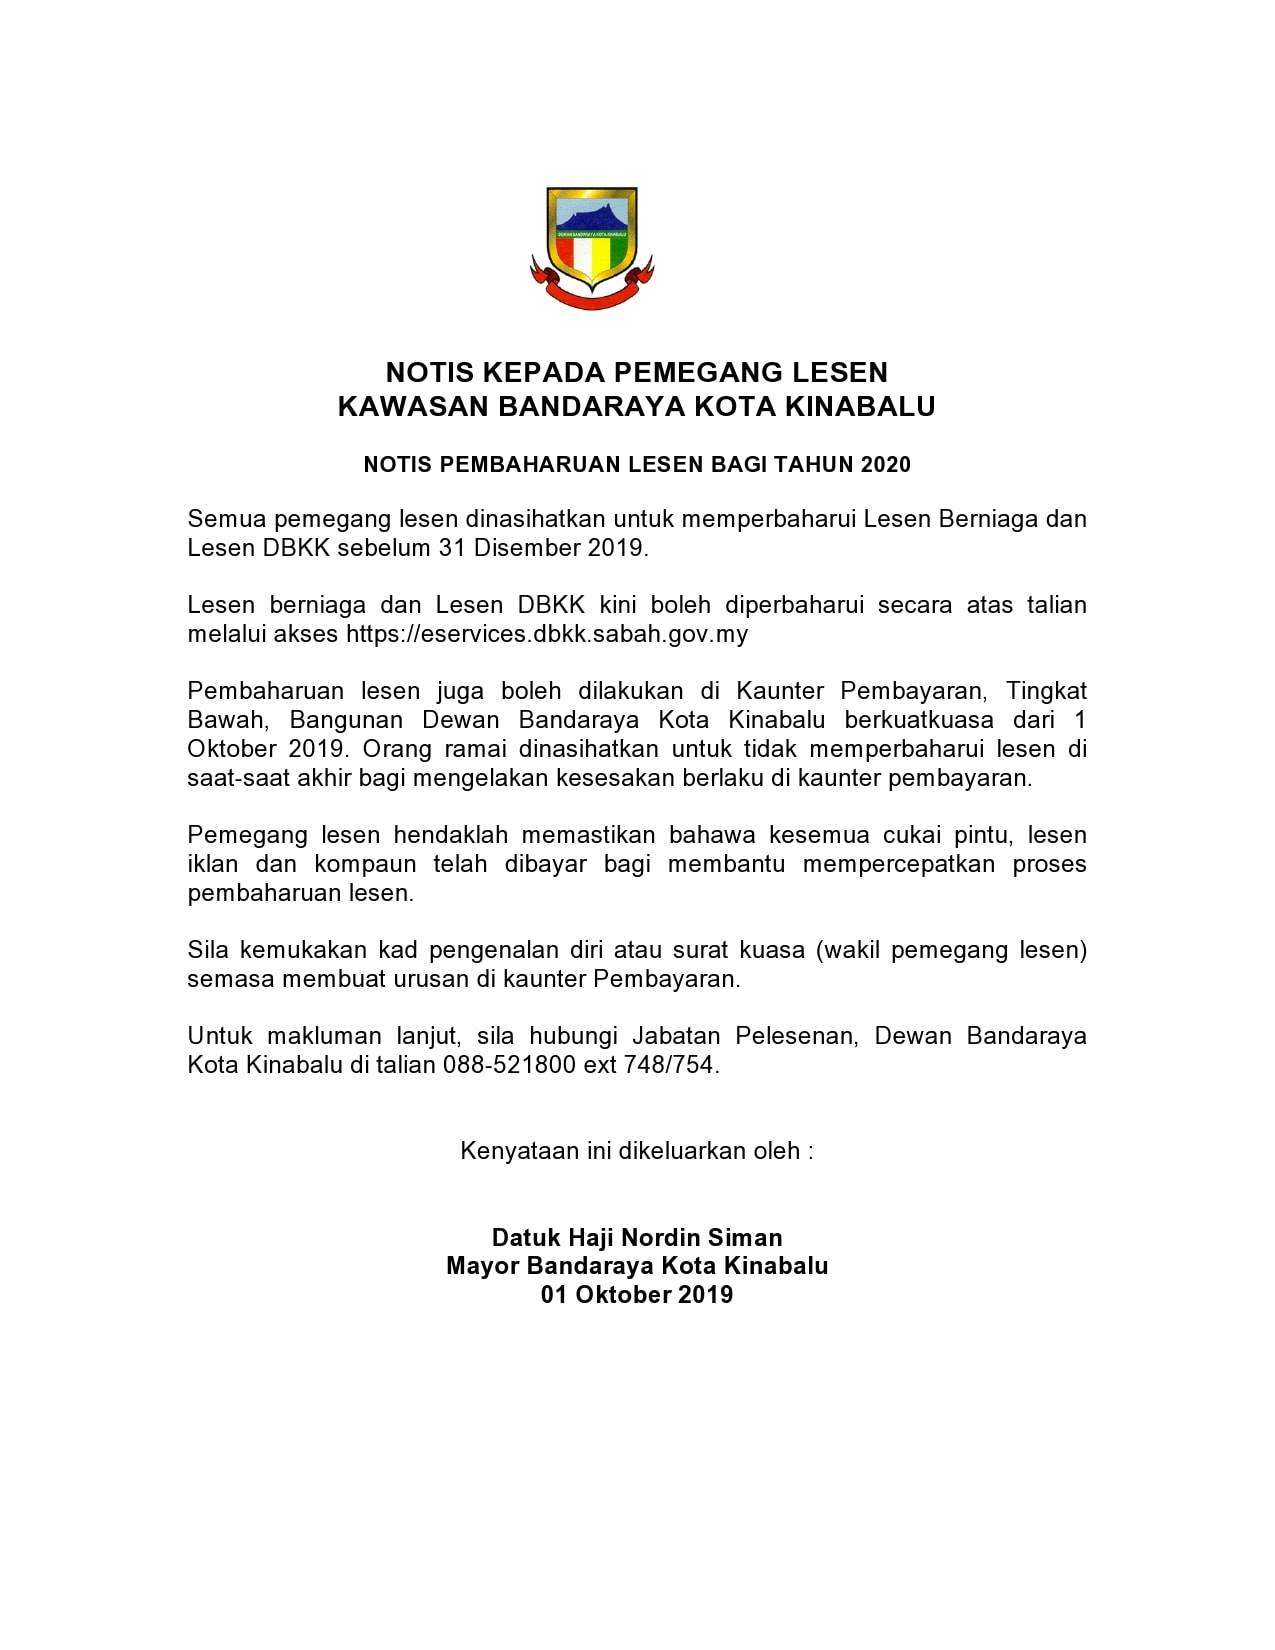 Dbkk trading licence notice